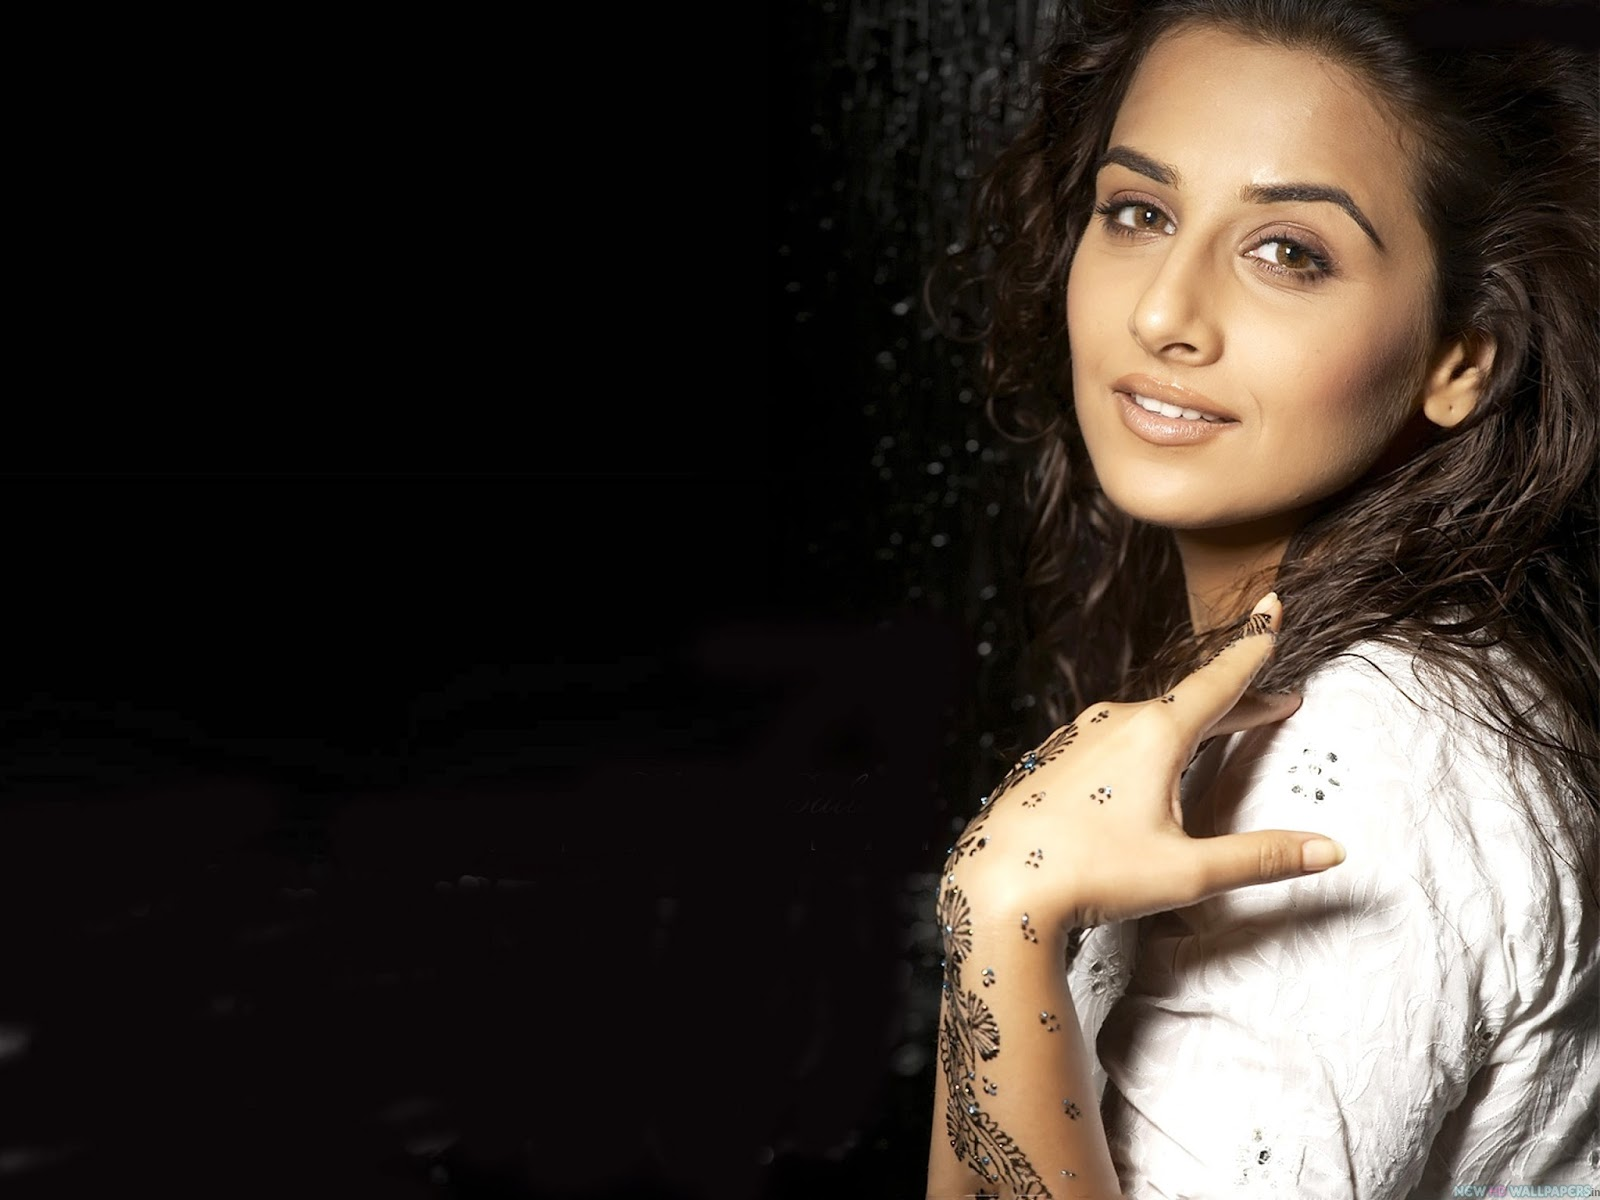 Vidya Balan Sexy Photo Hd